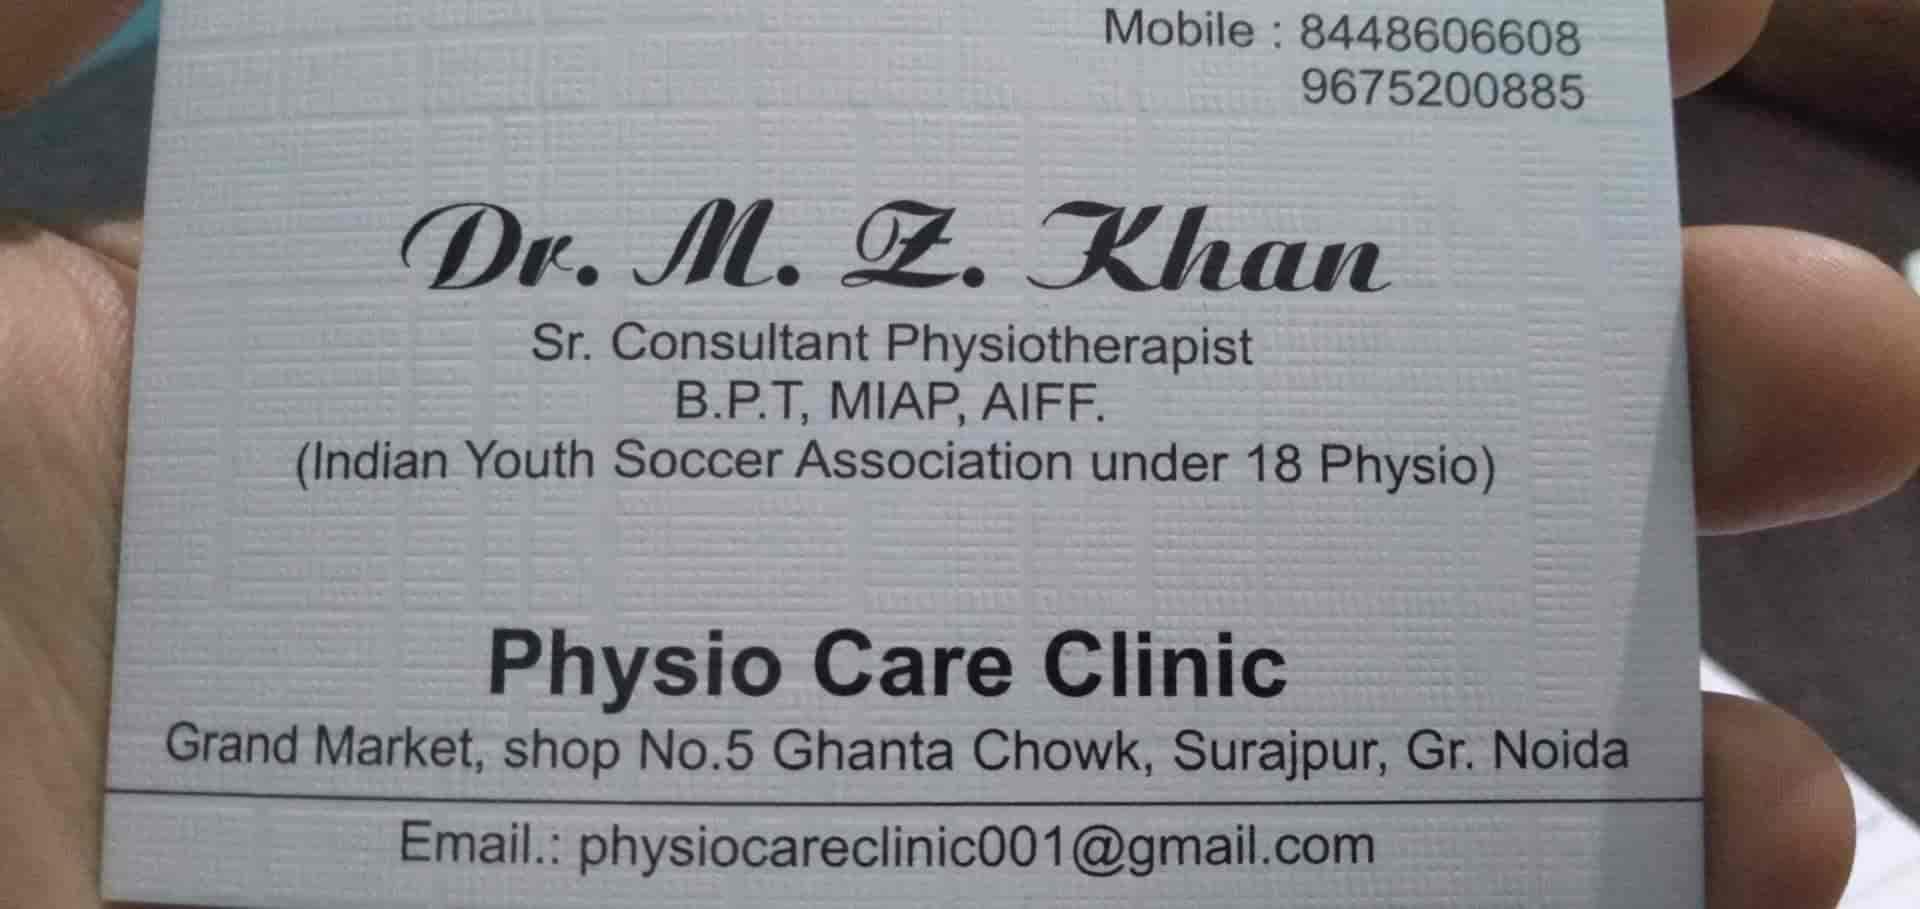 Physio Care Clinic Photos, Greater Noida, Noida- Pictures